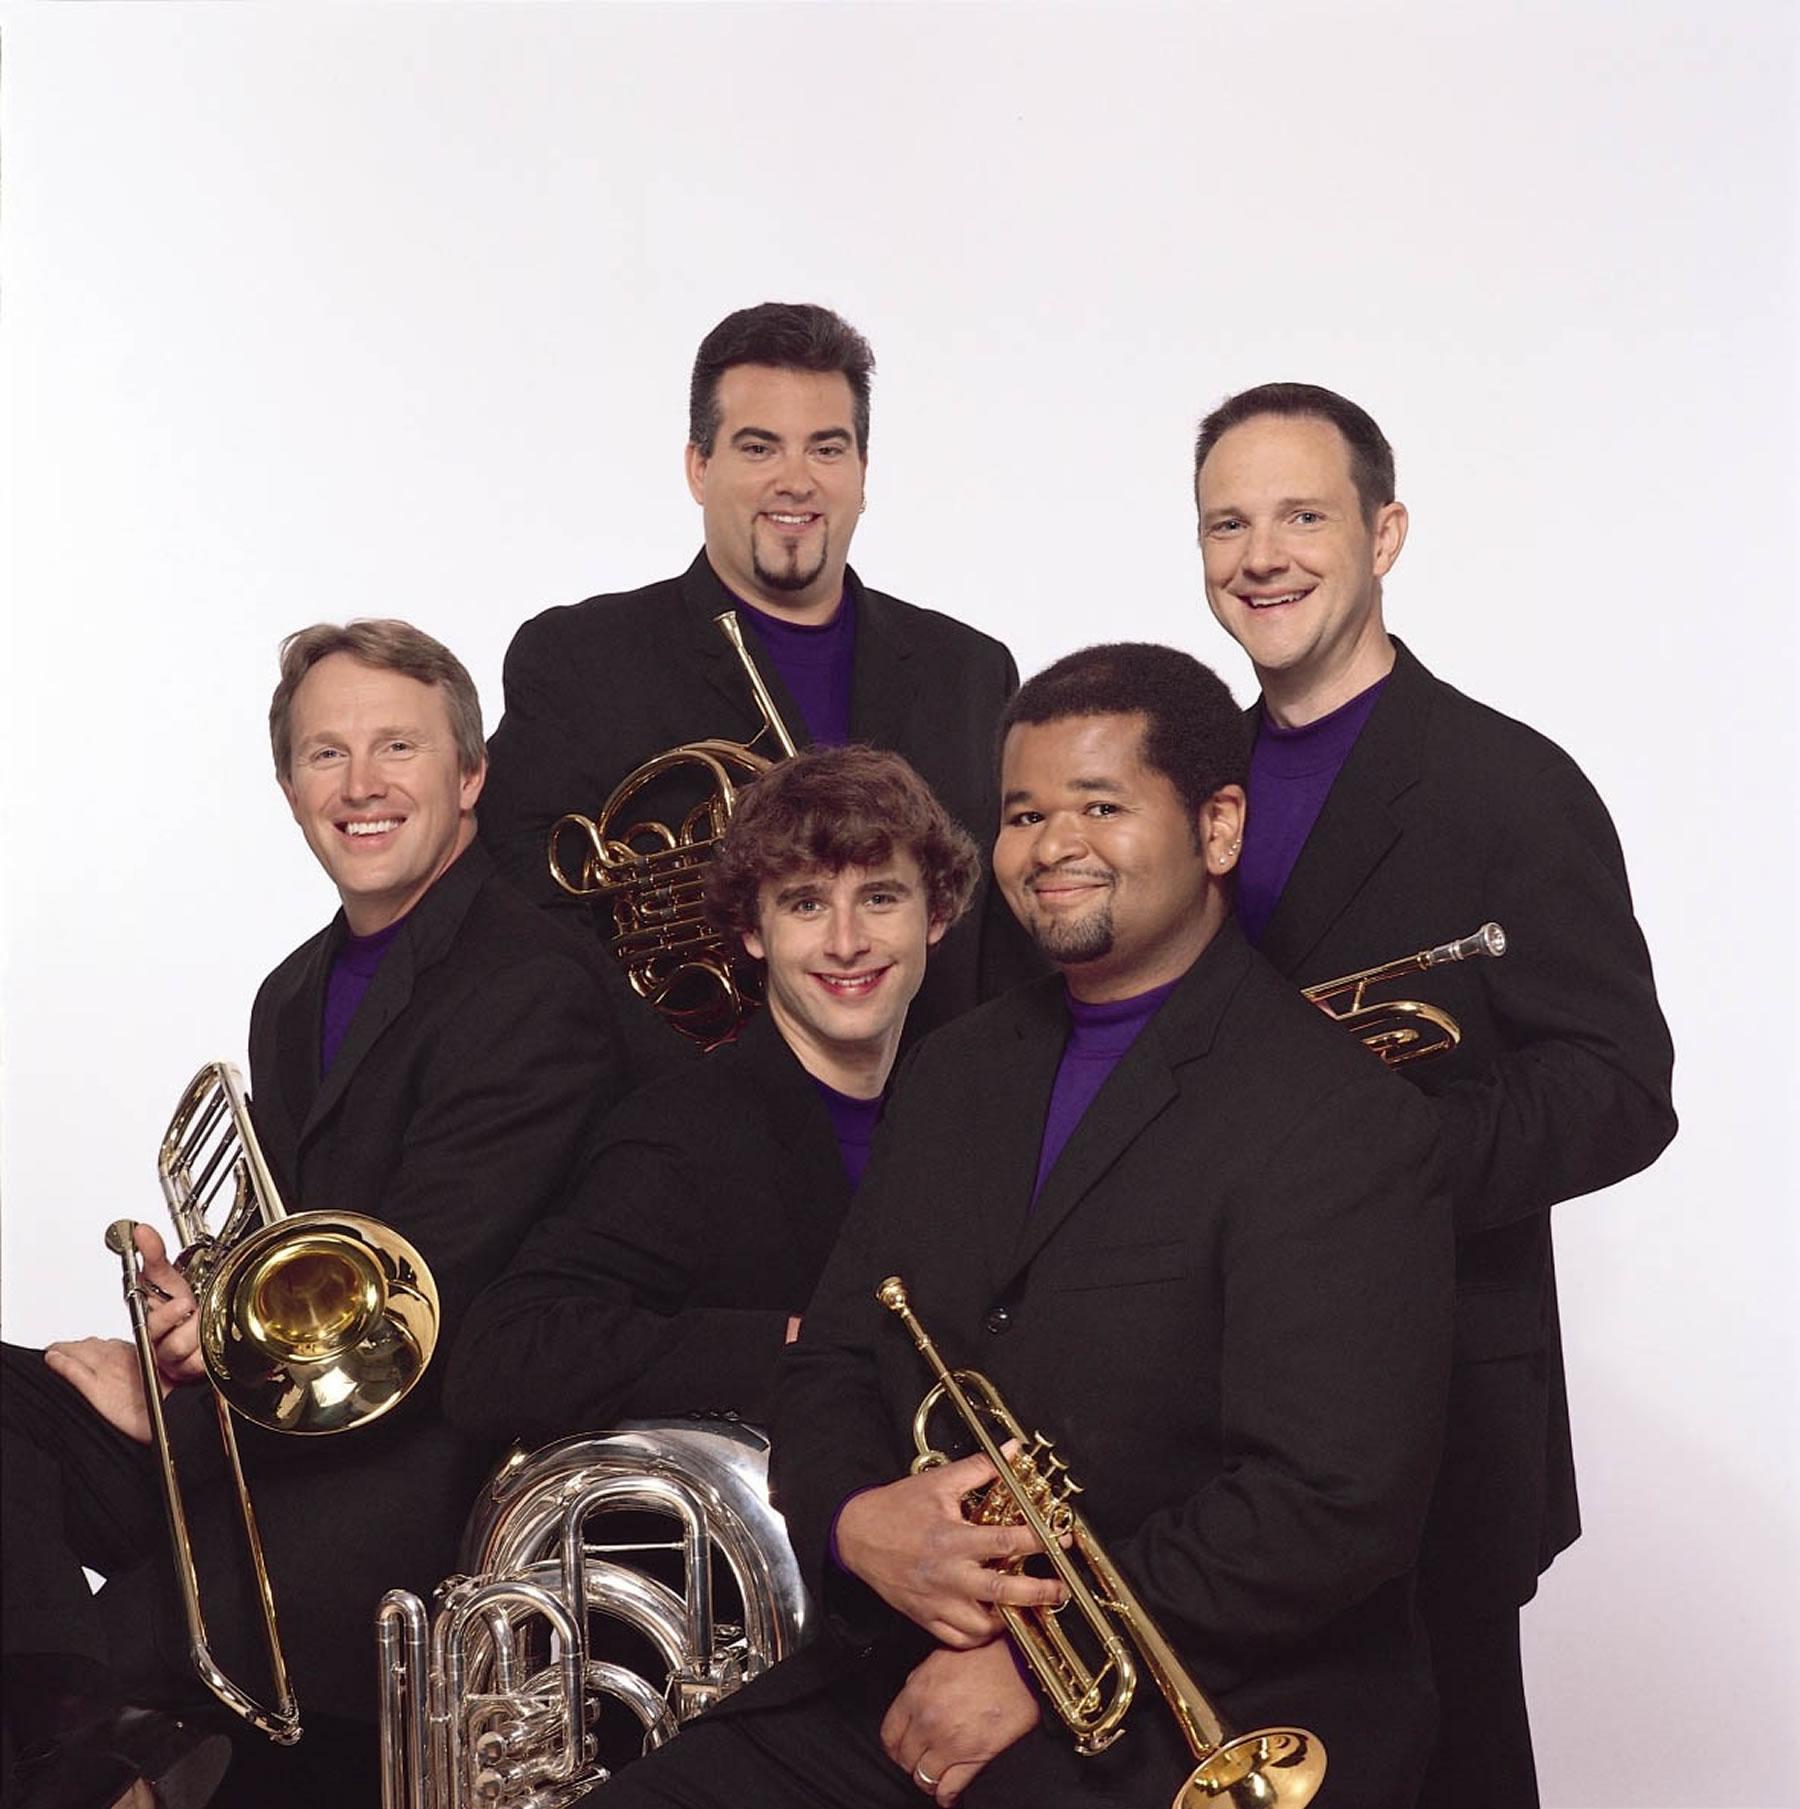 The Virtuoso Series welcomes the innovative Boston Brass, November 16 at 7:30 p.m., Libby Gardner Hall